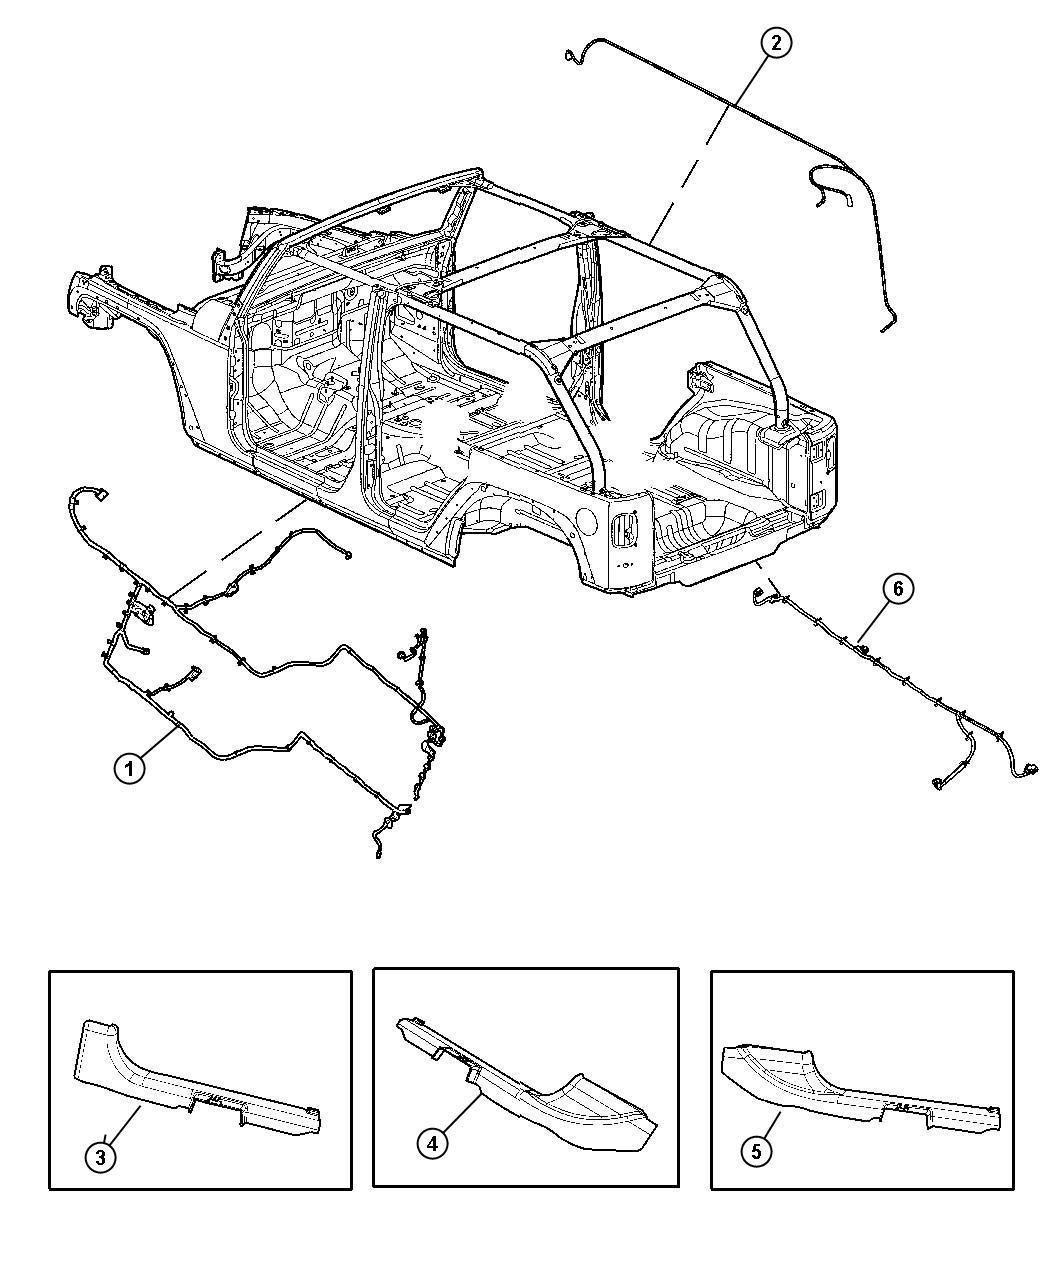 2010 jeep wrangler cover  wiring protector  left  trim   all trim codes  color   no